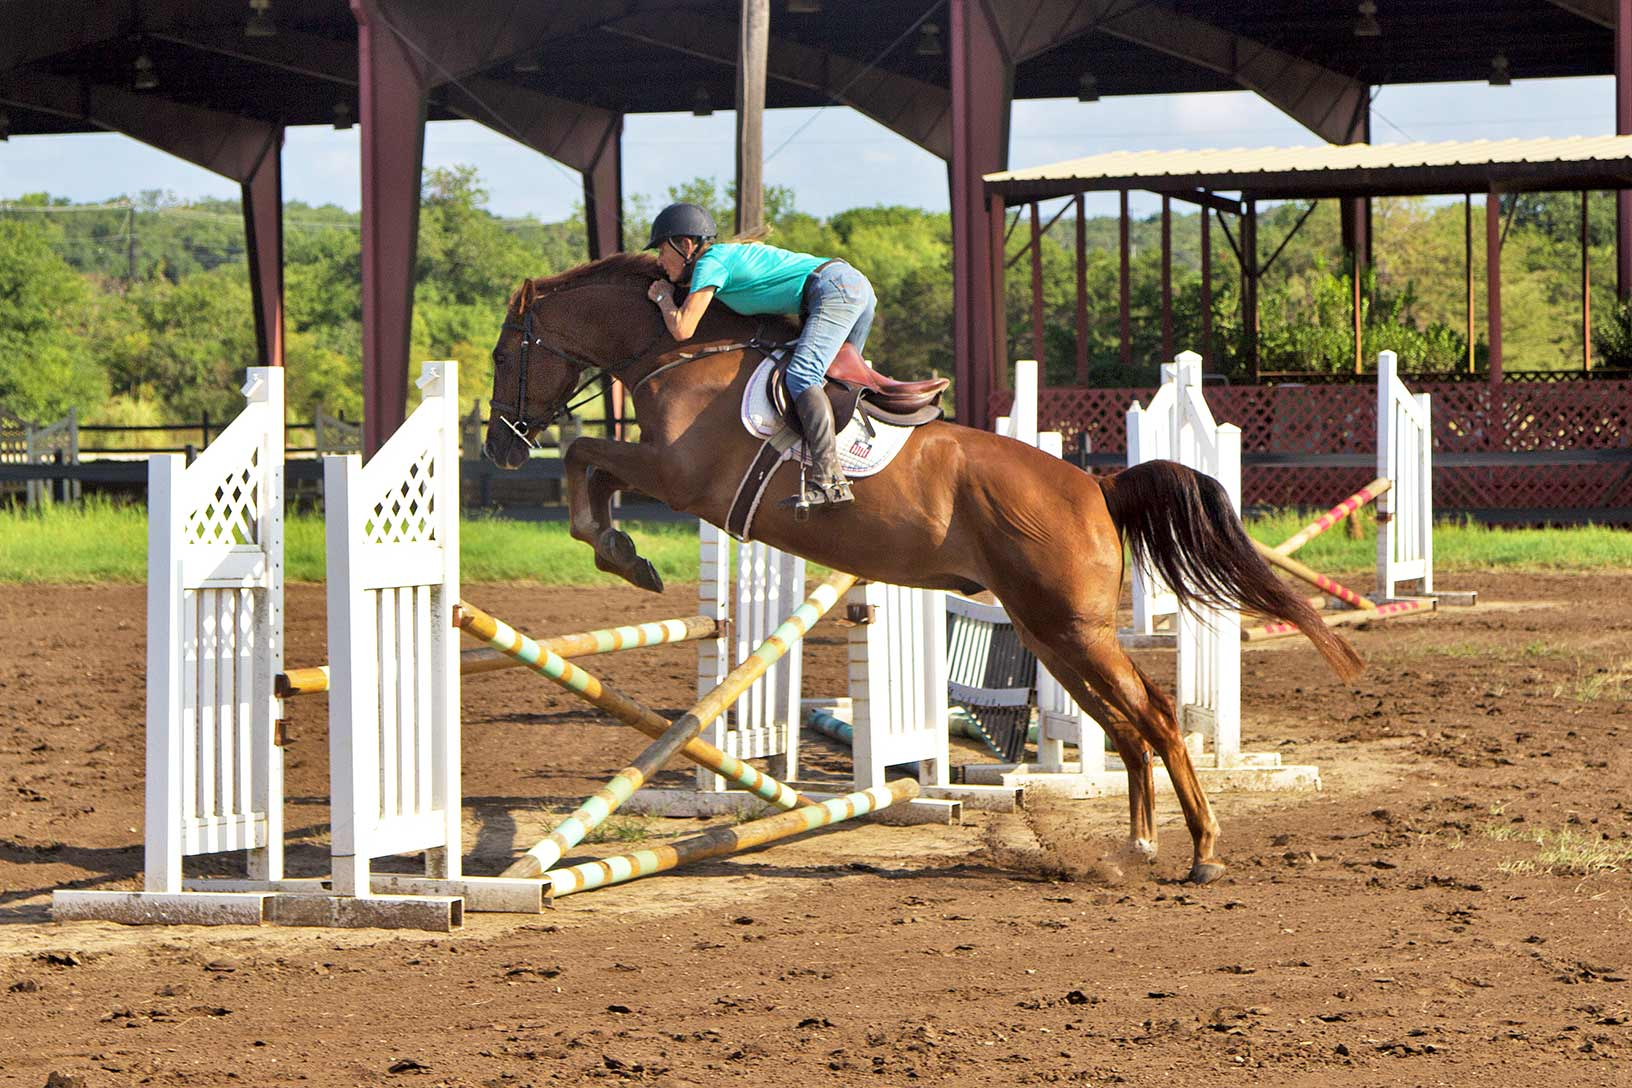 Sligo trained at the Russell Equestrian Center